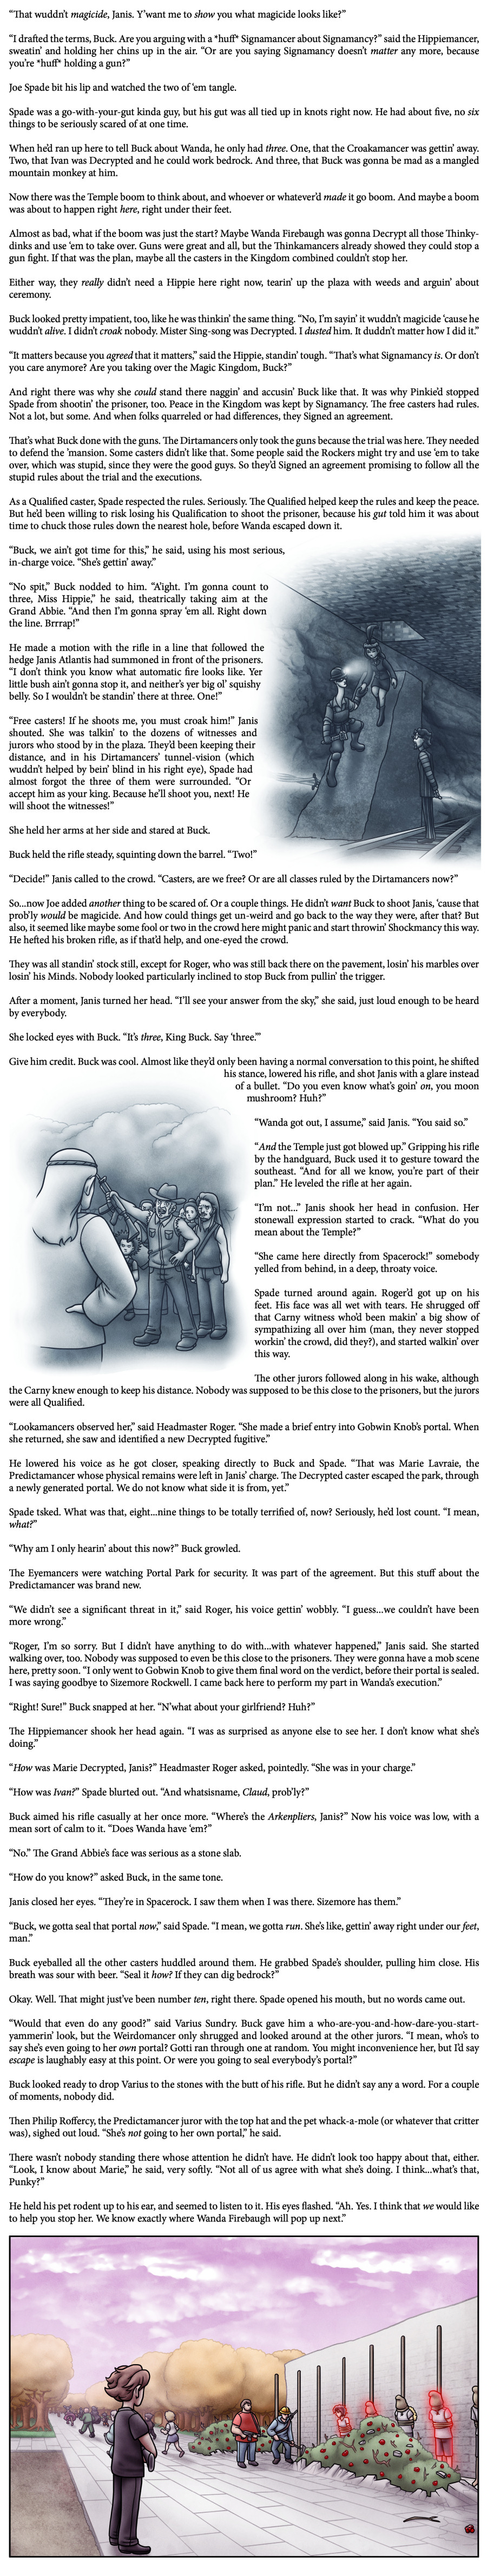 Comic - Book 4 - Page 111